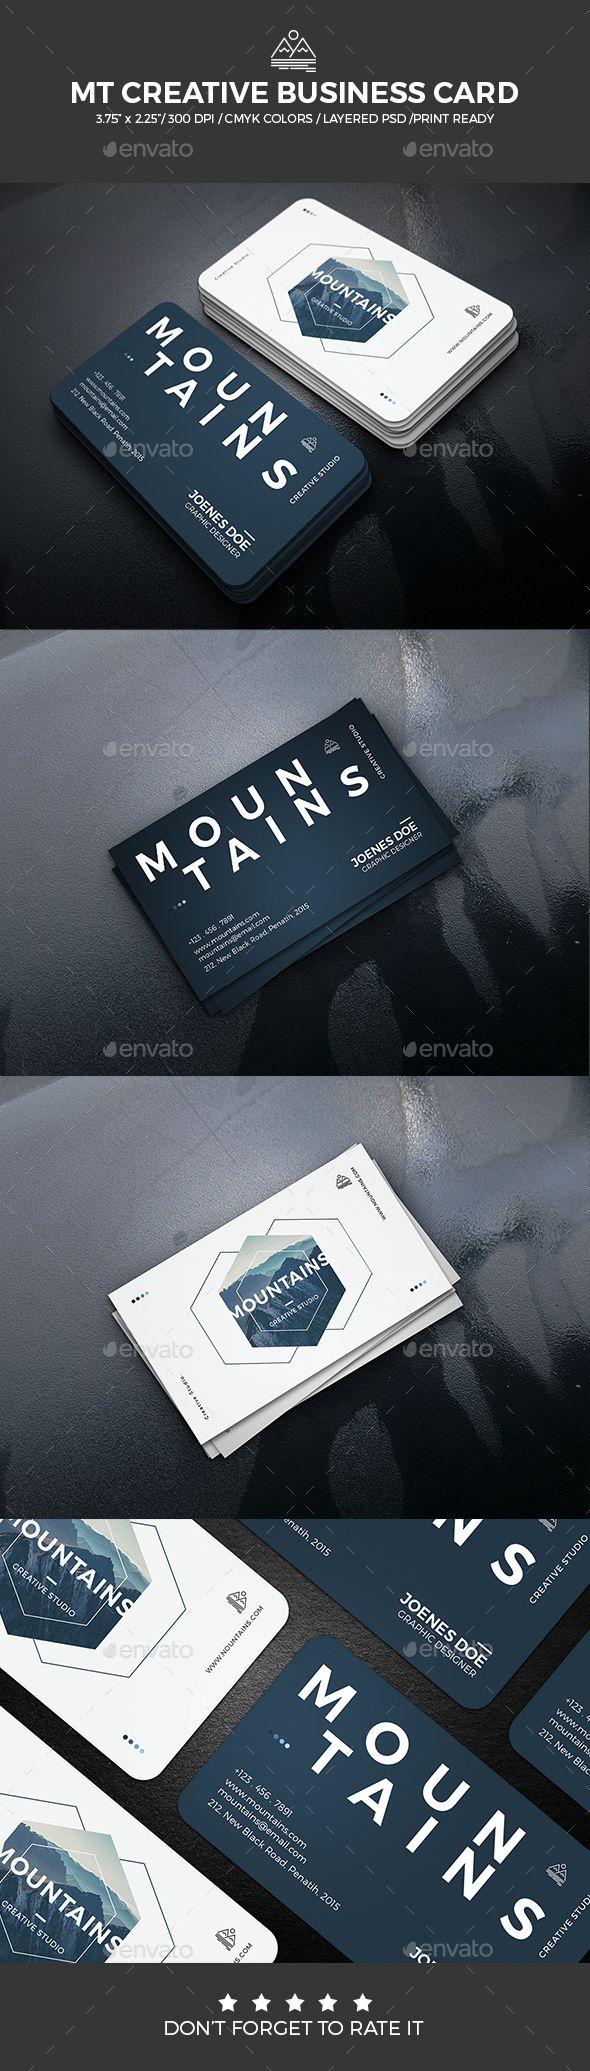 MT Creative Business Card